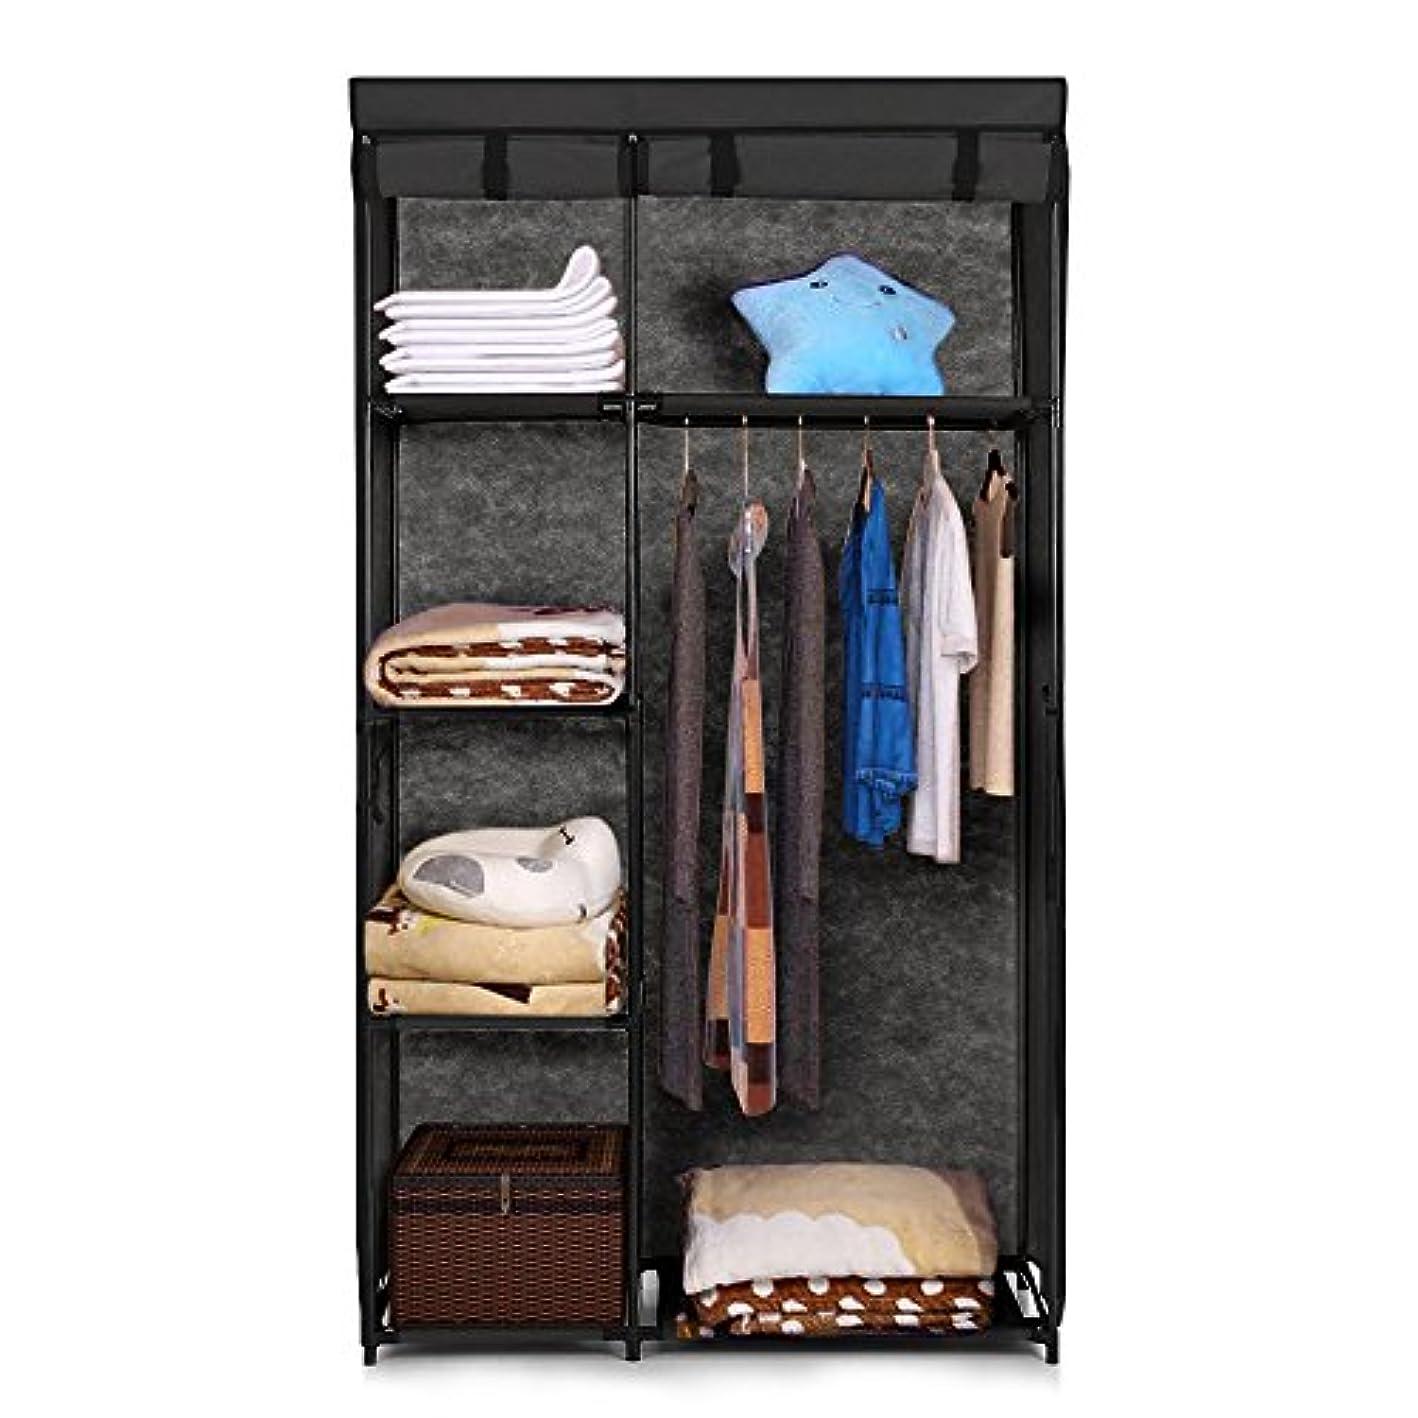 IKAYAA Portable Clothes Closet Wardrobe Cabinet Clothing Storage Organizer, 5 Storage Shelves 1 Hanging Rod (type1)